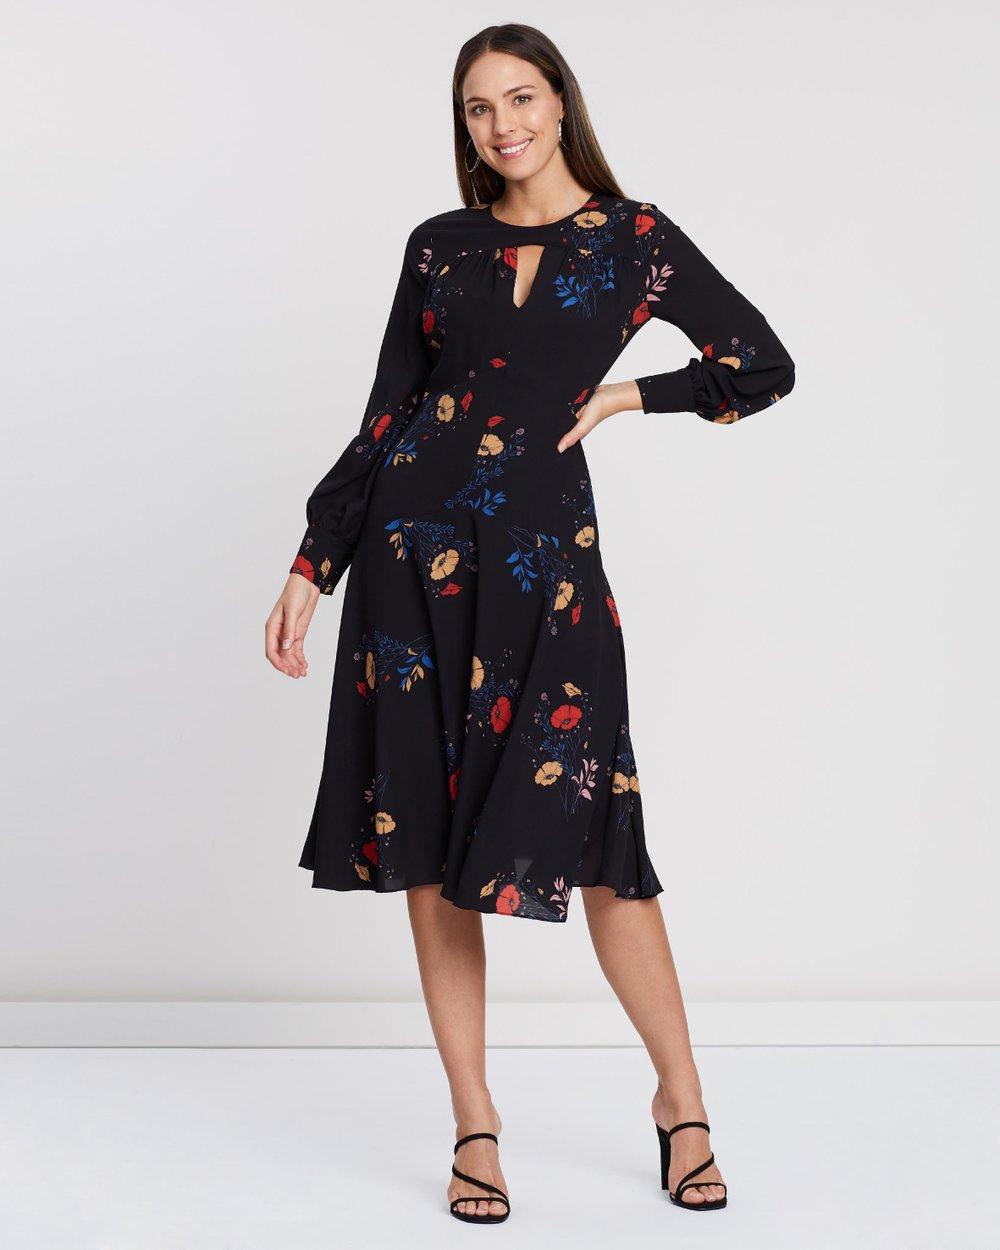 0d6c5eb46b35 Gogo Long Sleeve Midi Dress by Cooper St Online